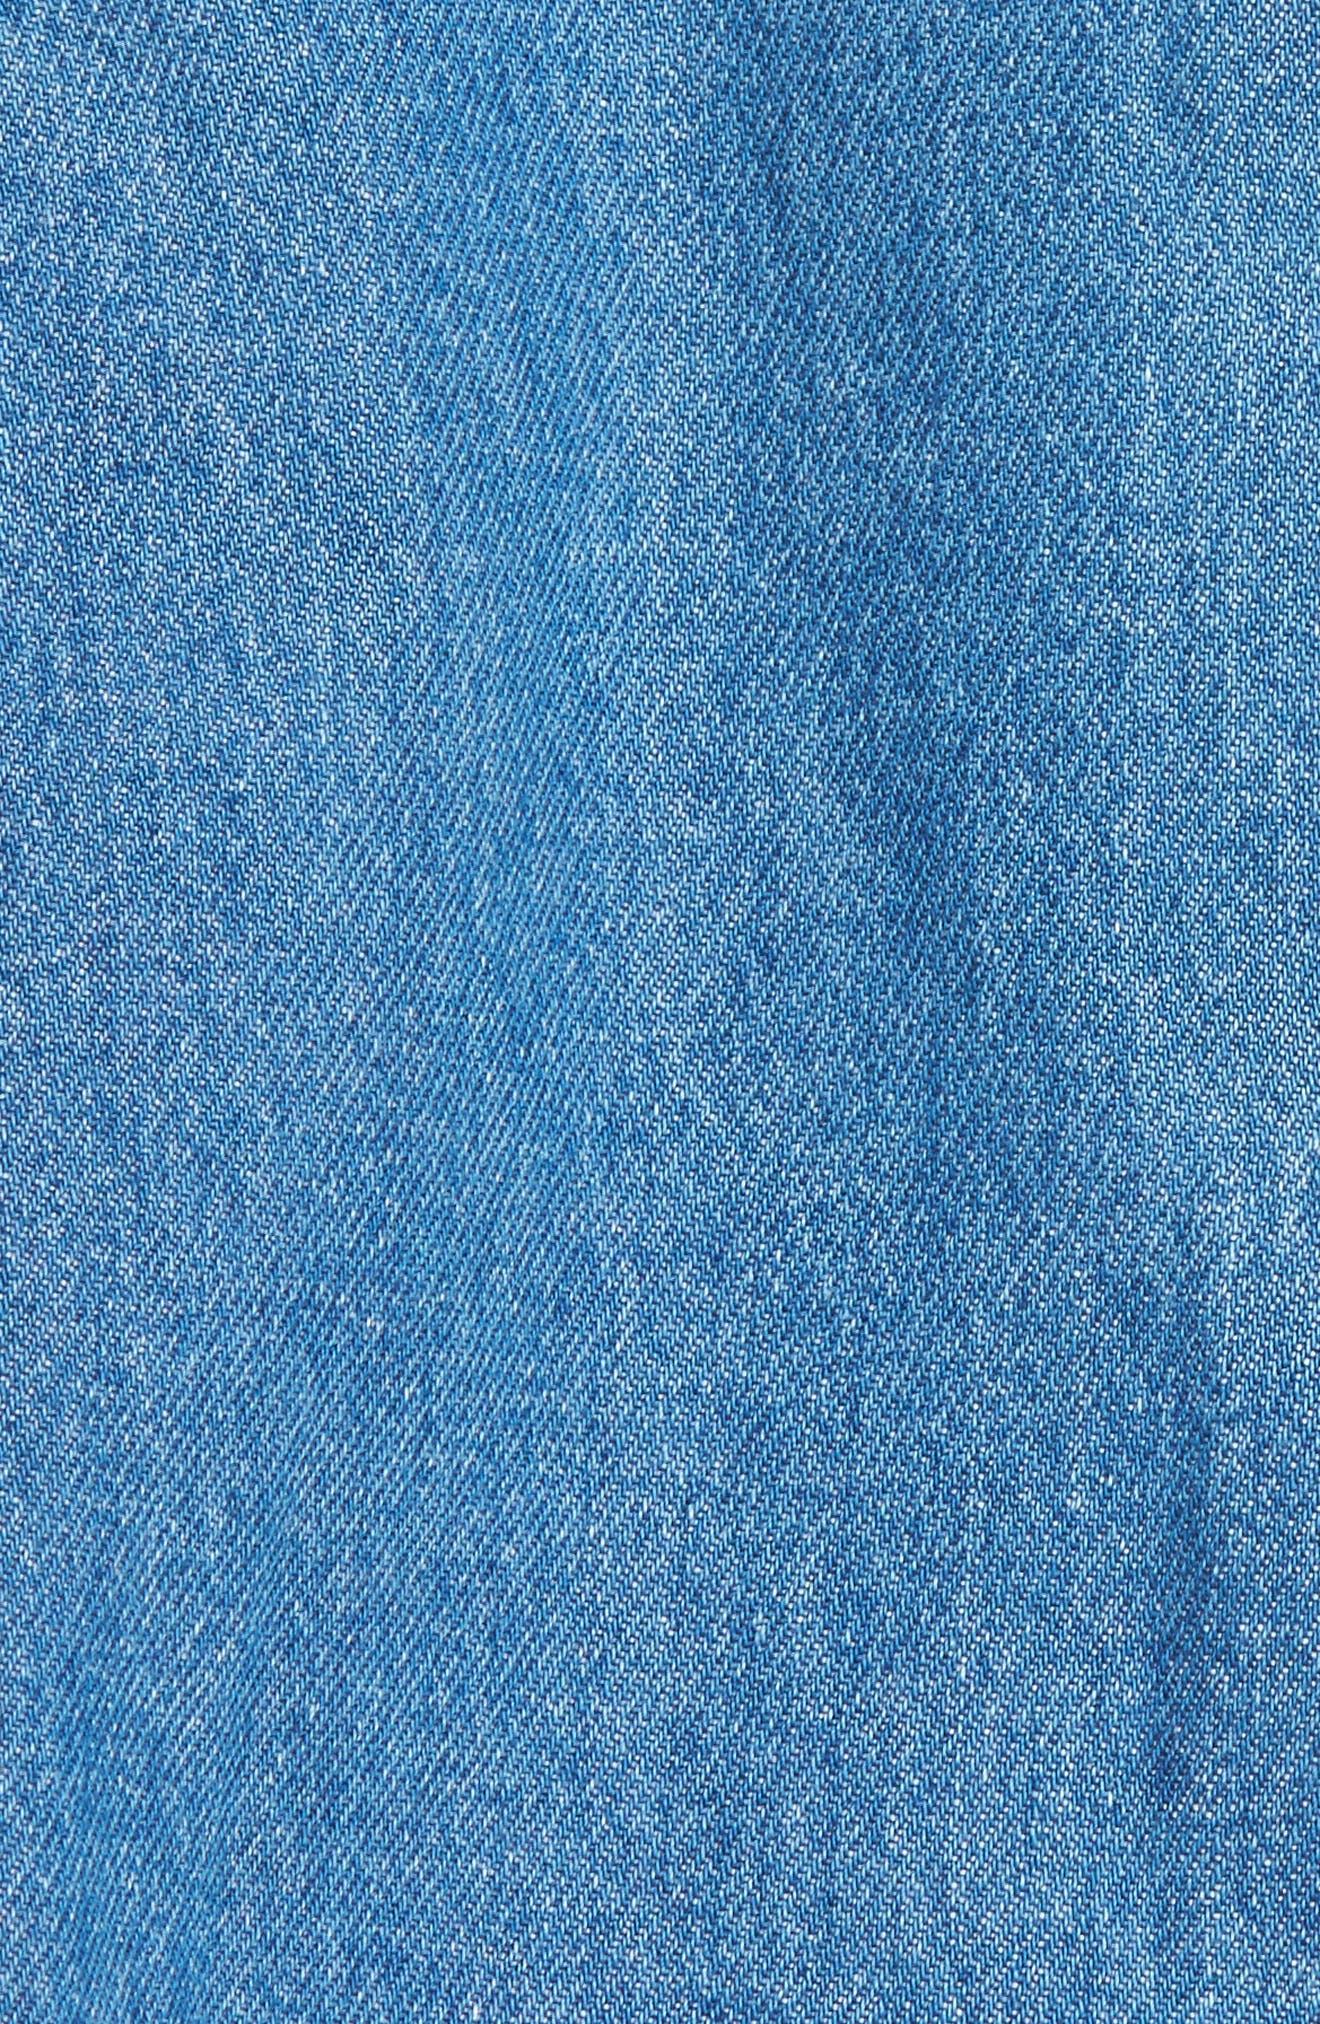 A-Line Skirt,                             Alternate thumbnail 5, color,                             401